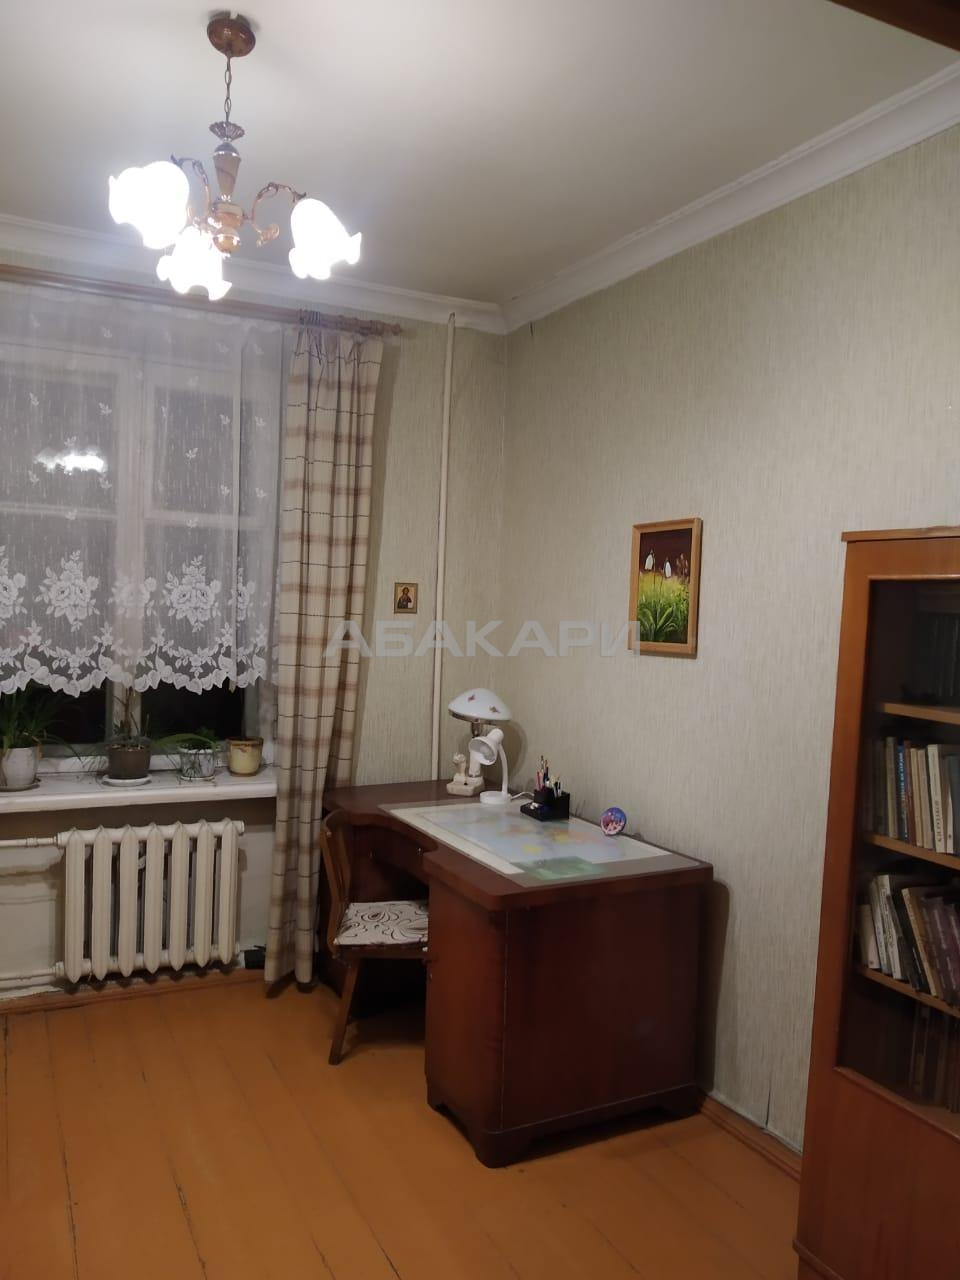 2к квартира 2-я Красногорская улица, 25 3/3 - 47кв | 23000 | аренда в Красноярске фото 4